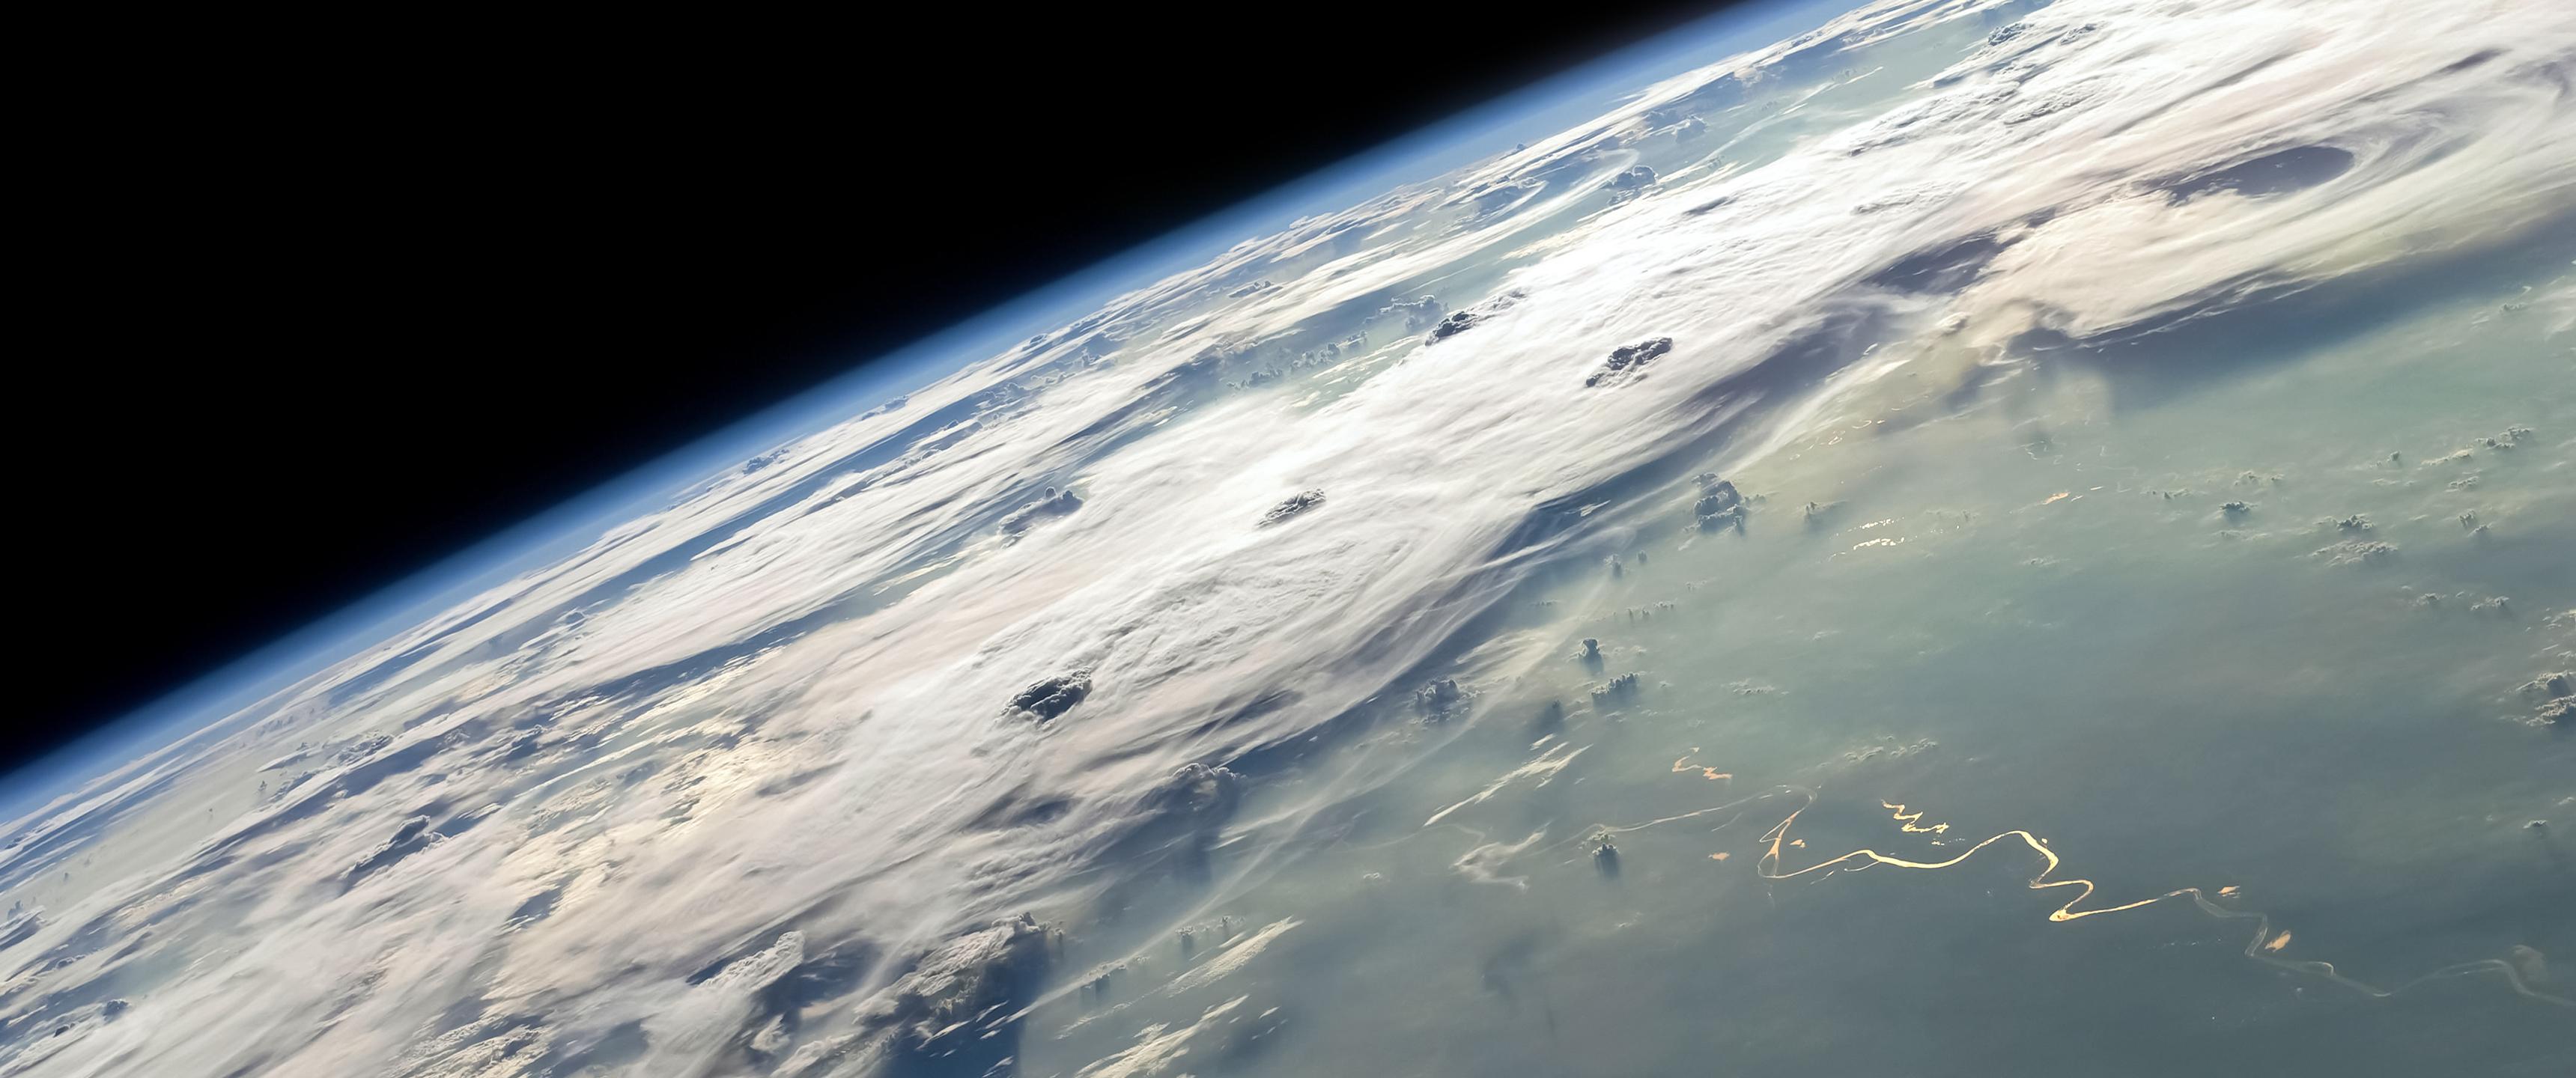 General 3440x1440 space Earth clouds space art digital art planet atmosphere